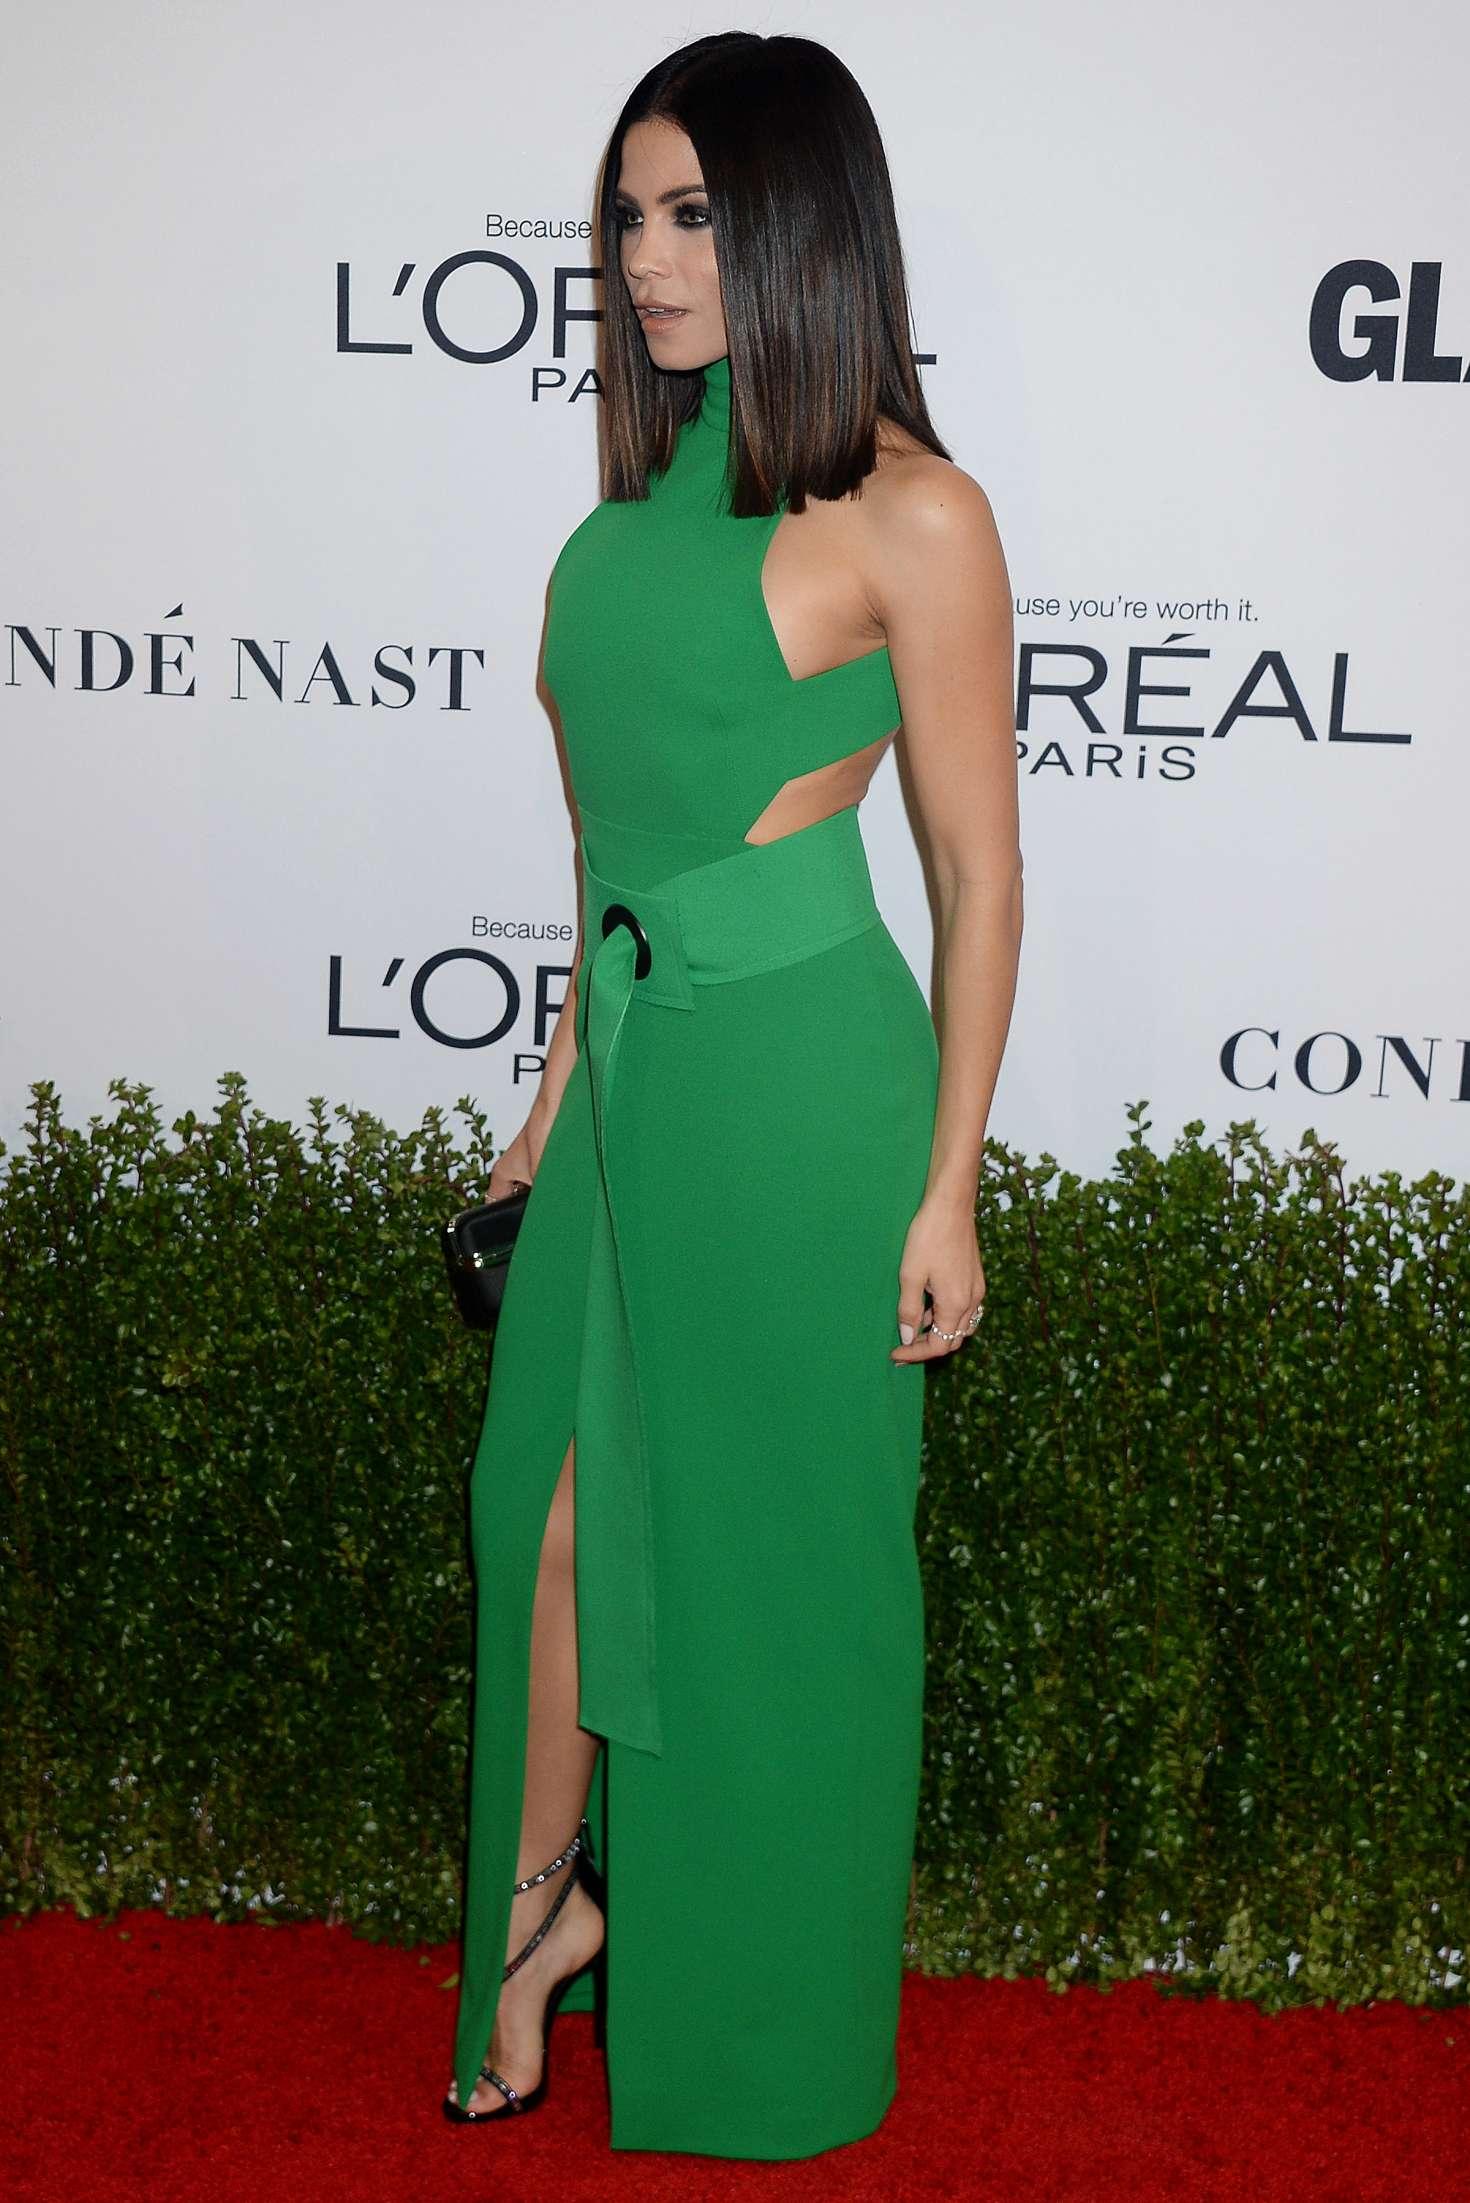 Jenna Dewan Tatum - 2016 Glamour Women Of The Year in Los Angeles